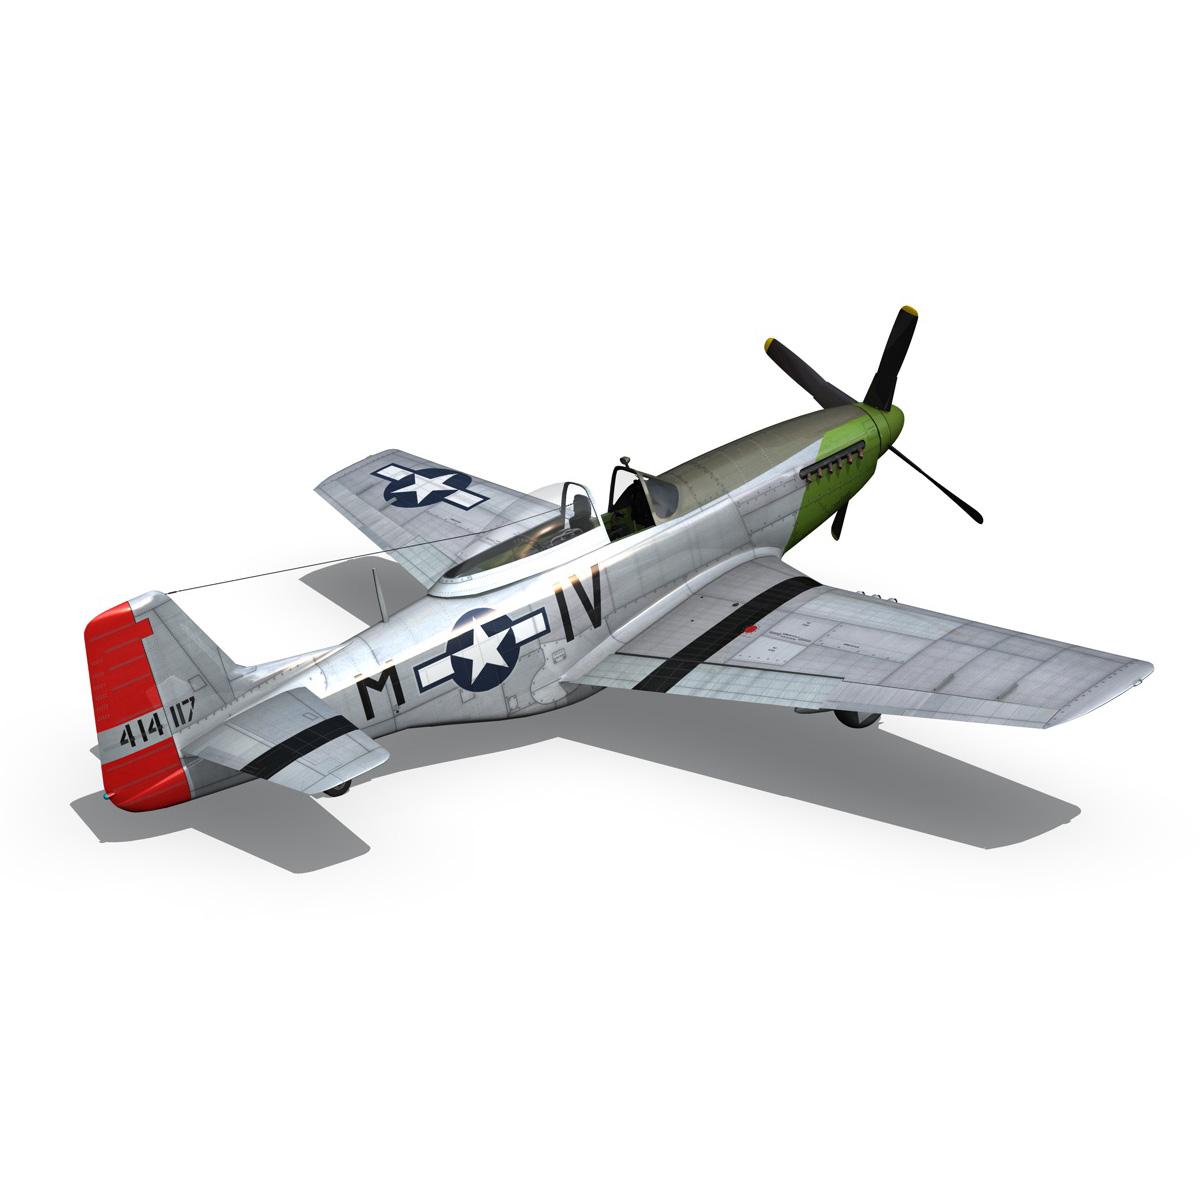 north american p-51d mustang – stinky 3d model fbx c4d lwo obj 269607